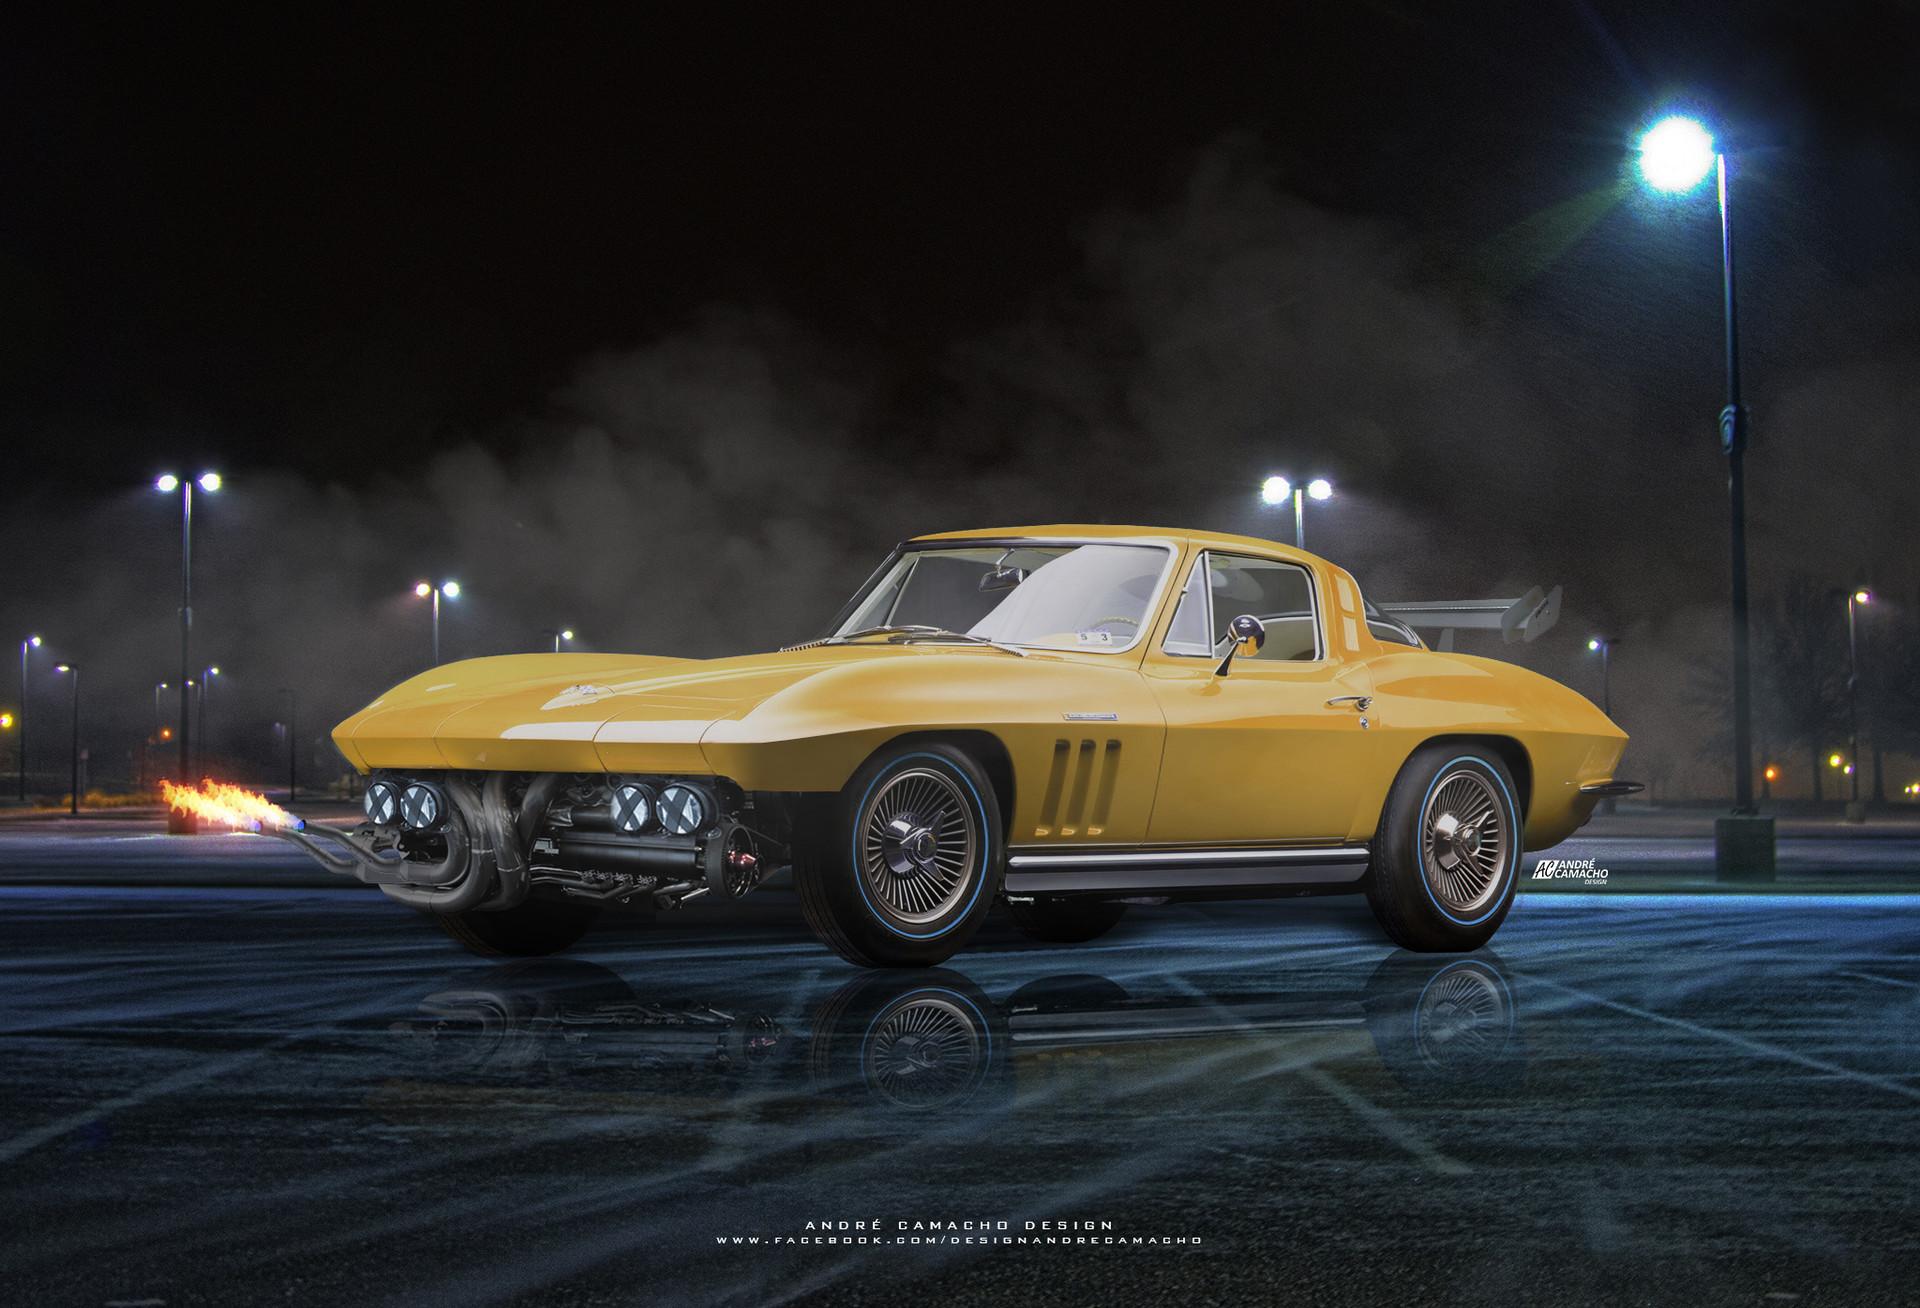 Andre camacho design 1965 chevrolet corvette